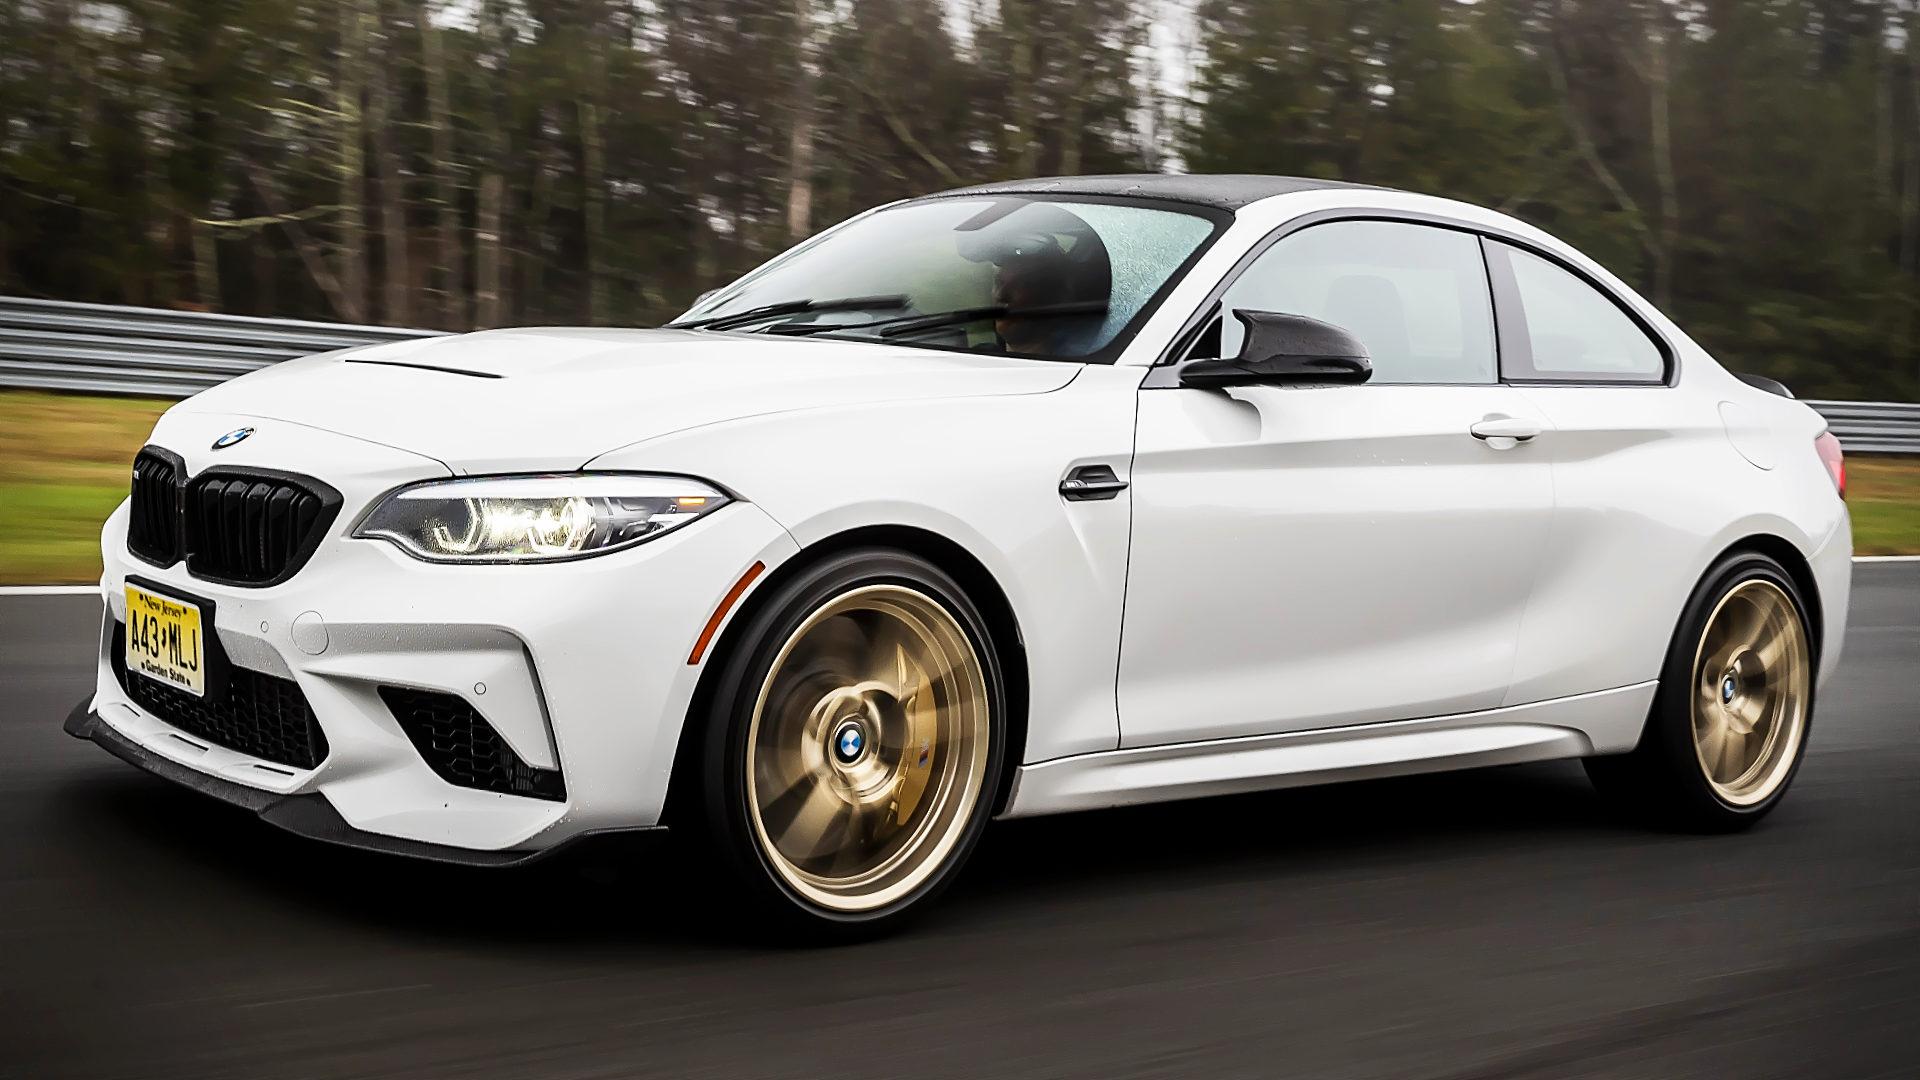 2021 BMW M2 CS White